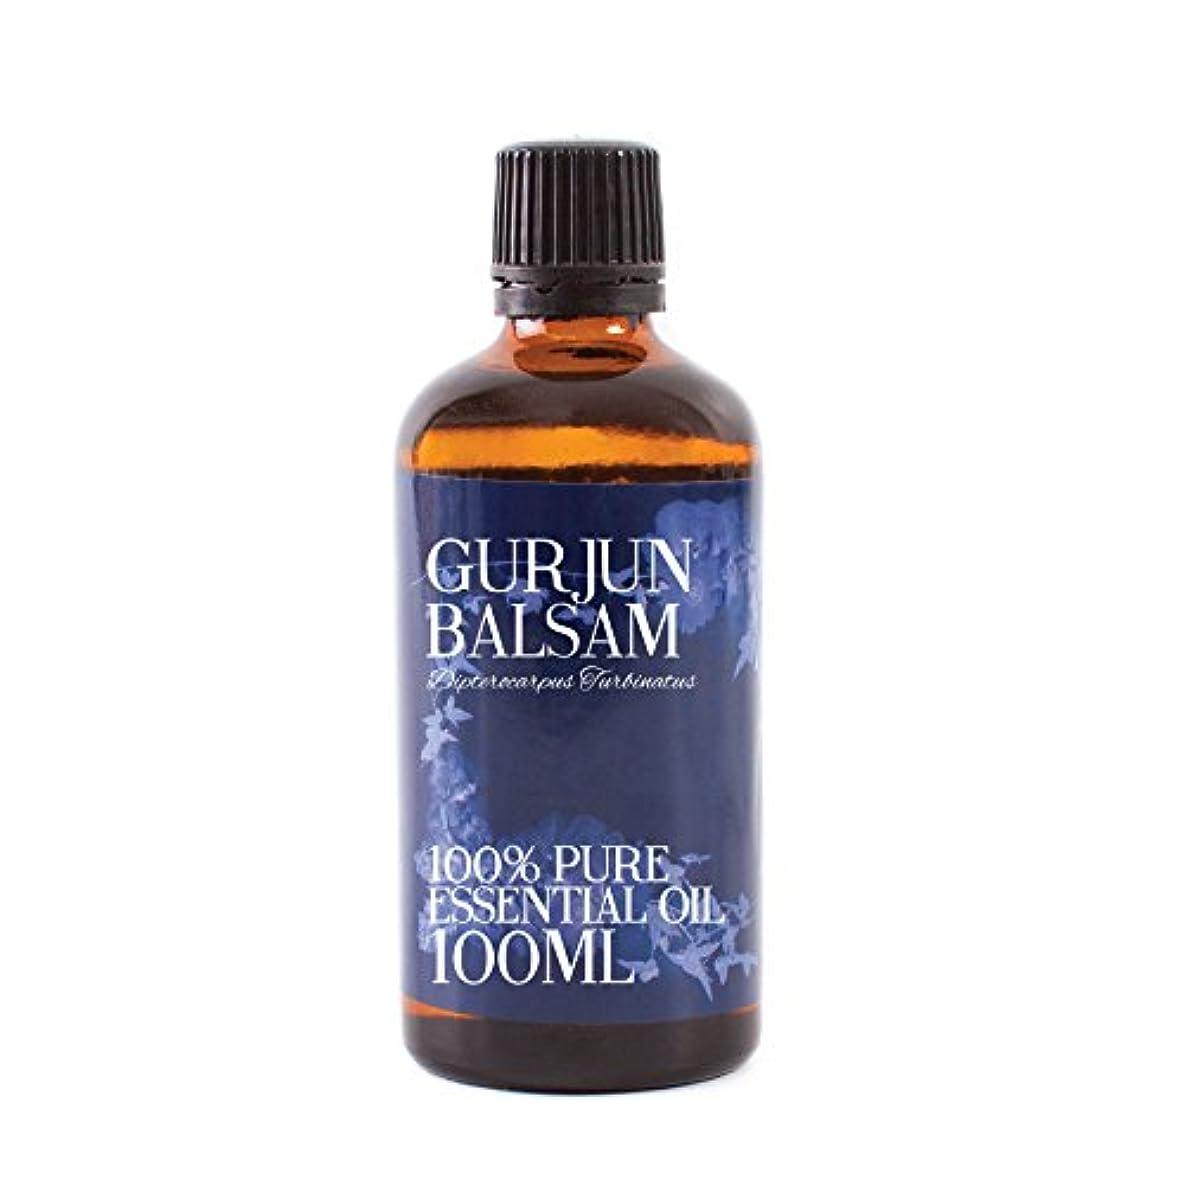 Mystic Moments   Gurjun Balsam Essential Oil - 100ml - 100% Pure